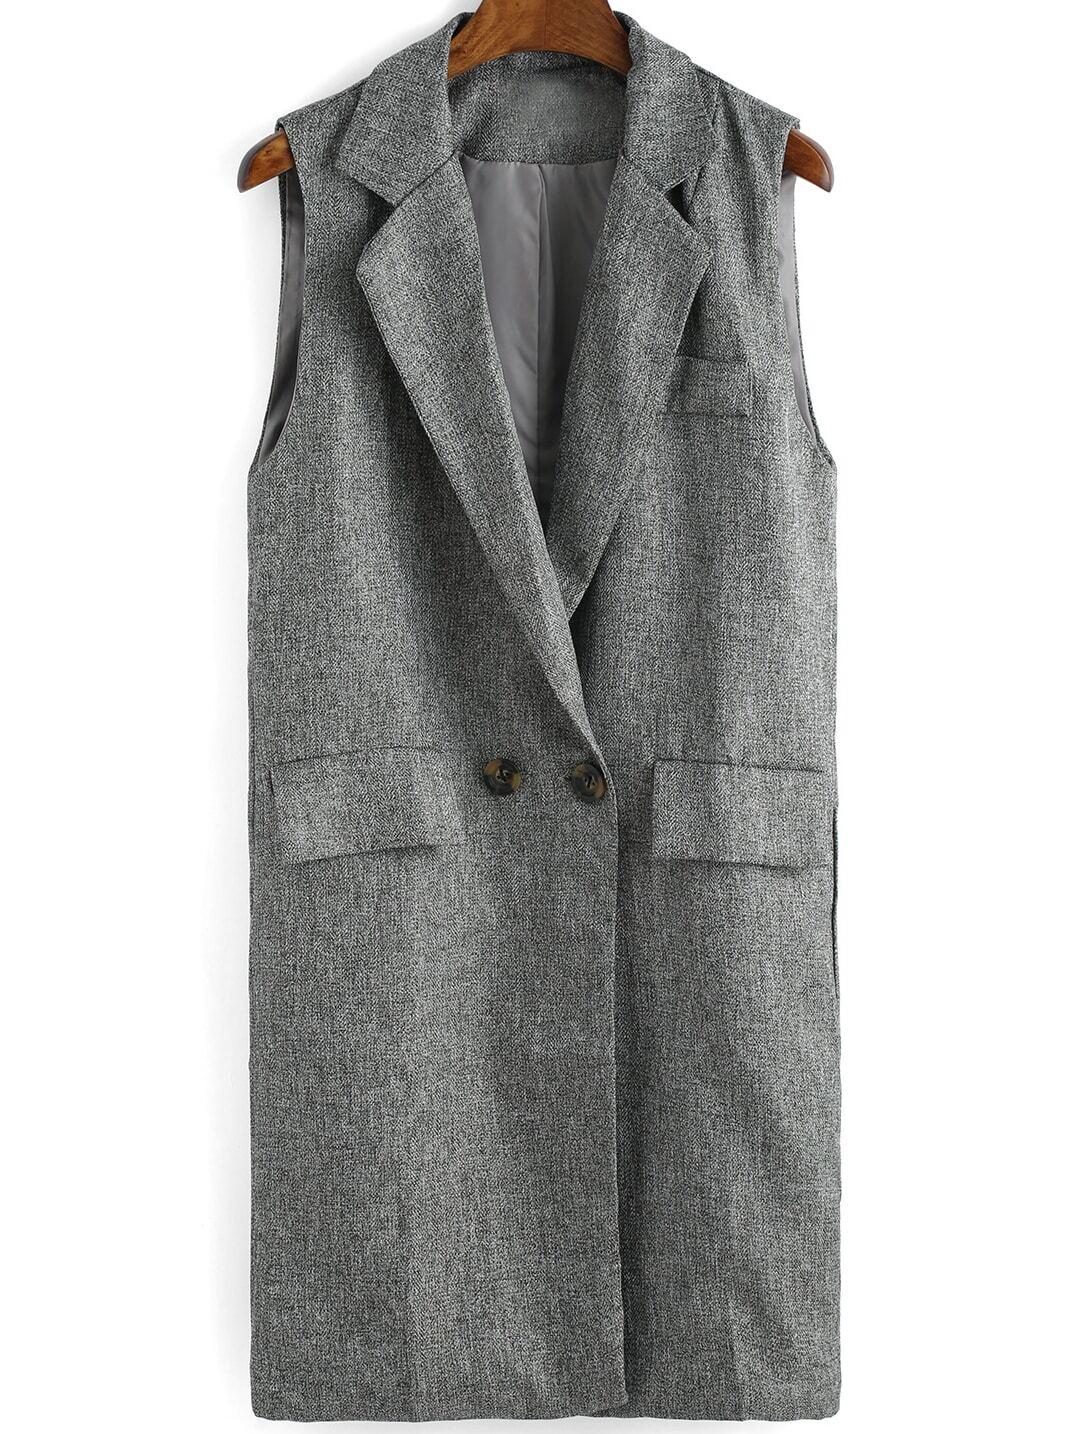 Grey Lapel Sleeveless Double Breasted Blazer